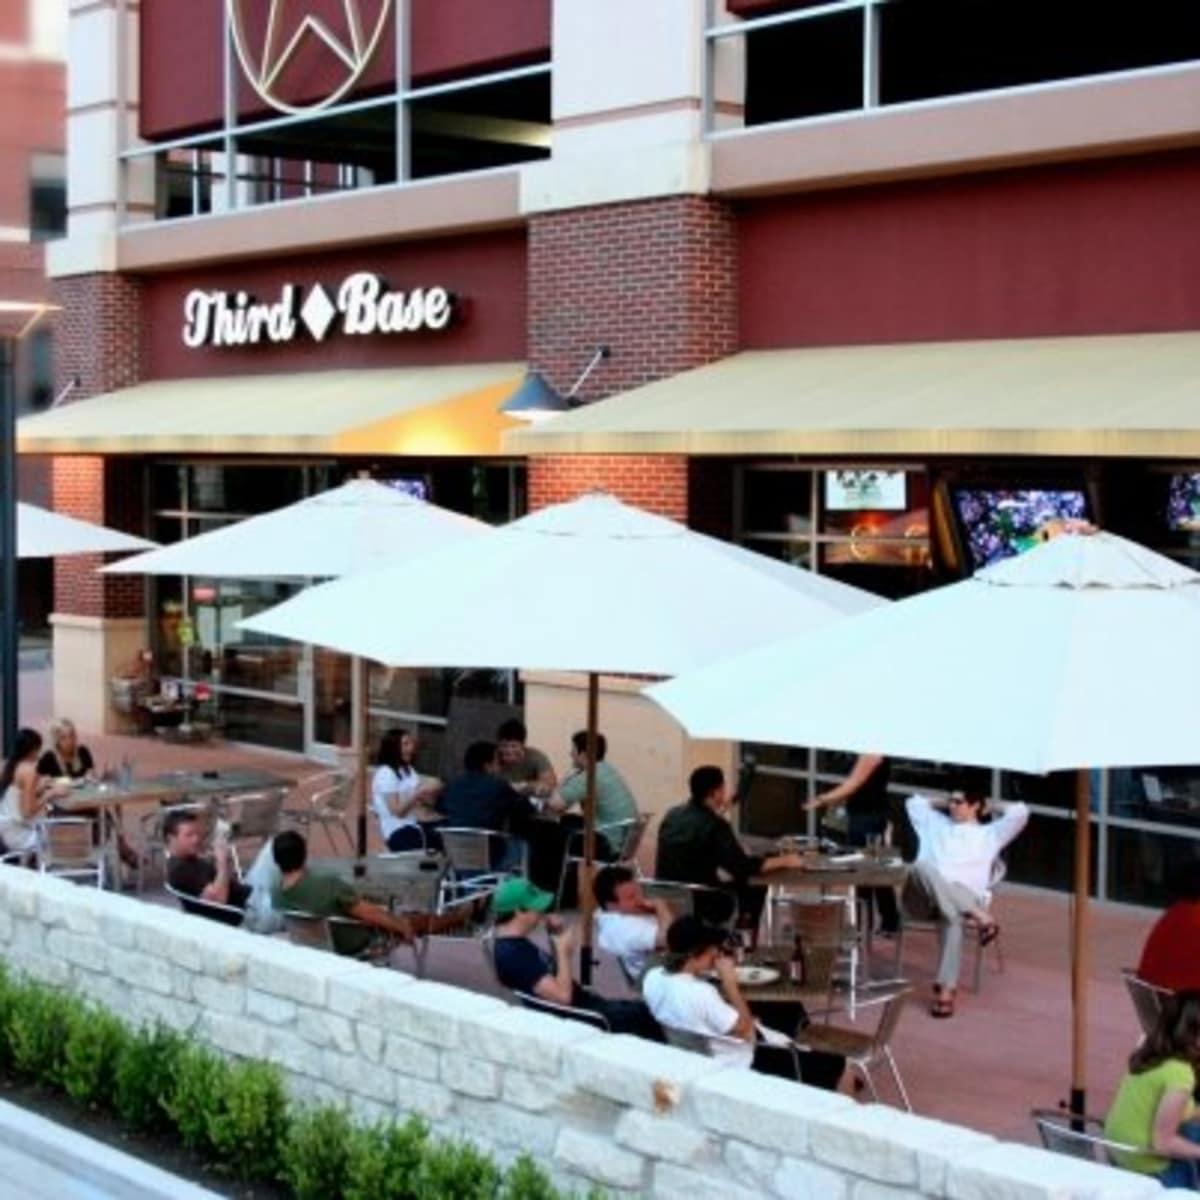 Austin Photo: Places_food_third base_exterior